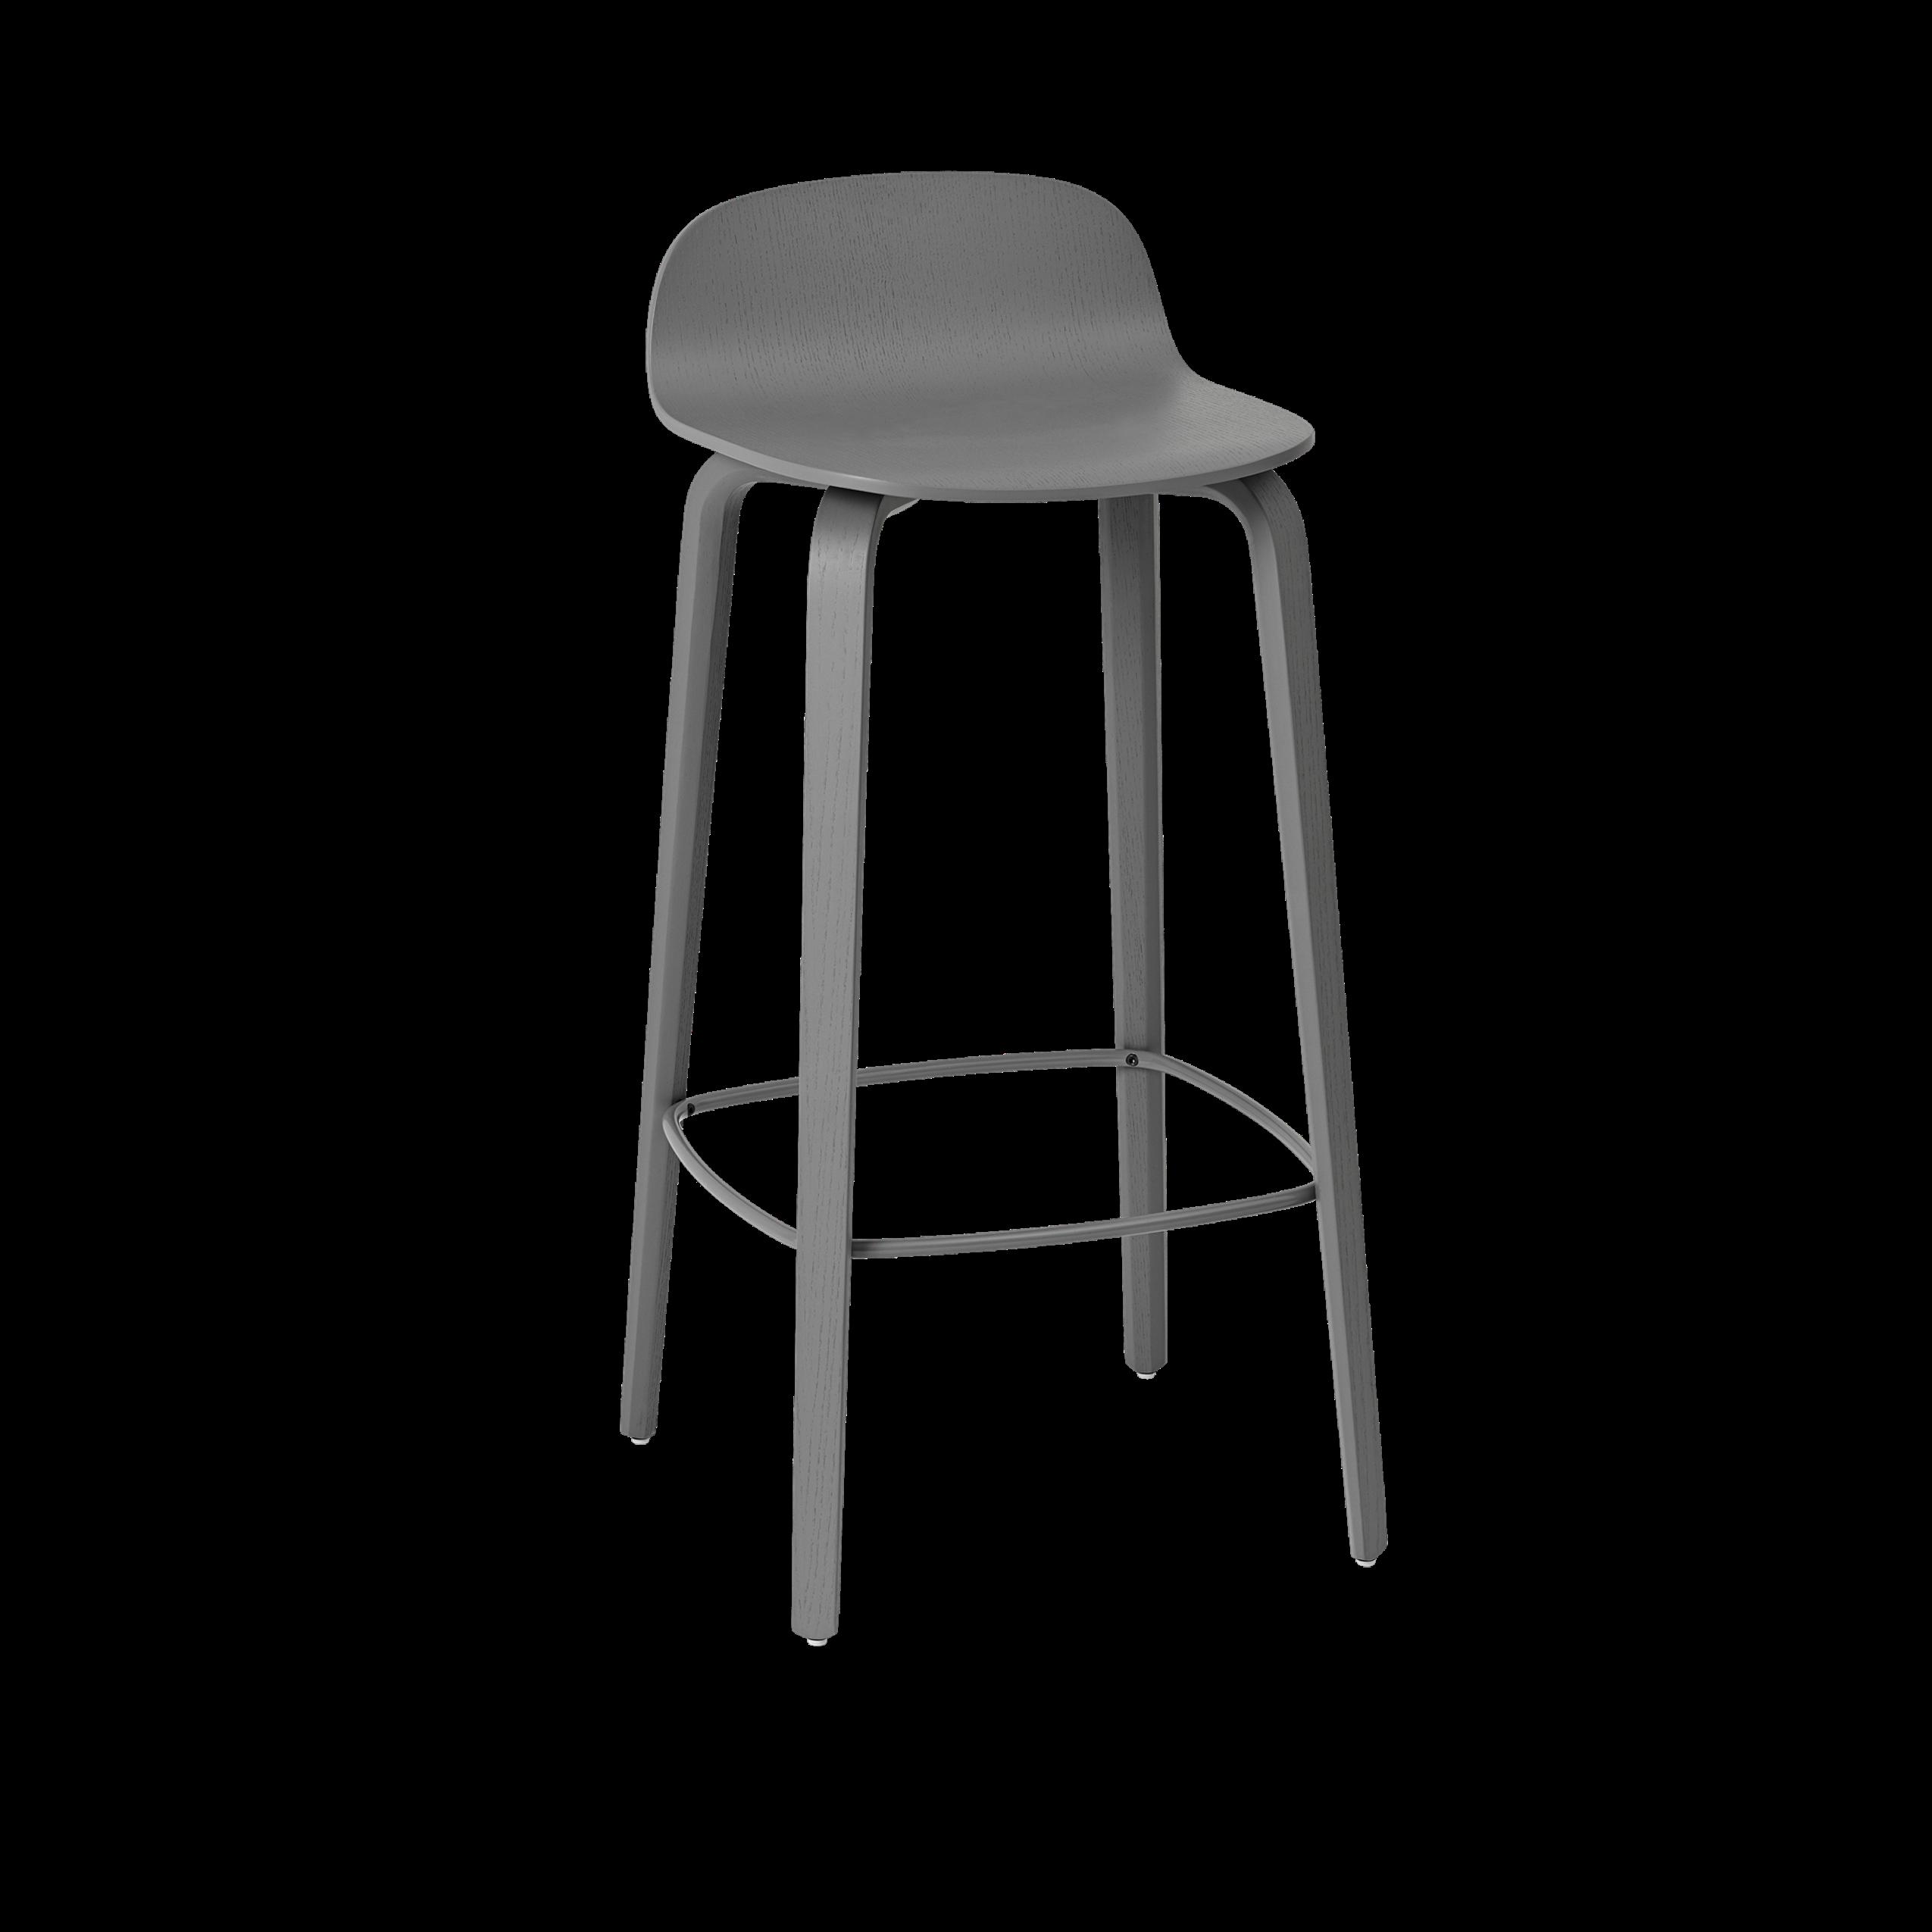 Chairs Mika Tolvanen Visu Bar Stool 1502288086 Bar Stools Stool Modern Bar Stools